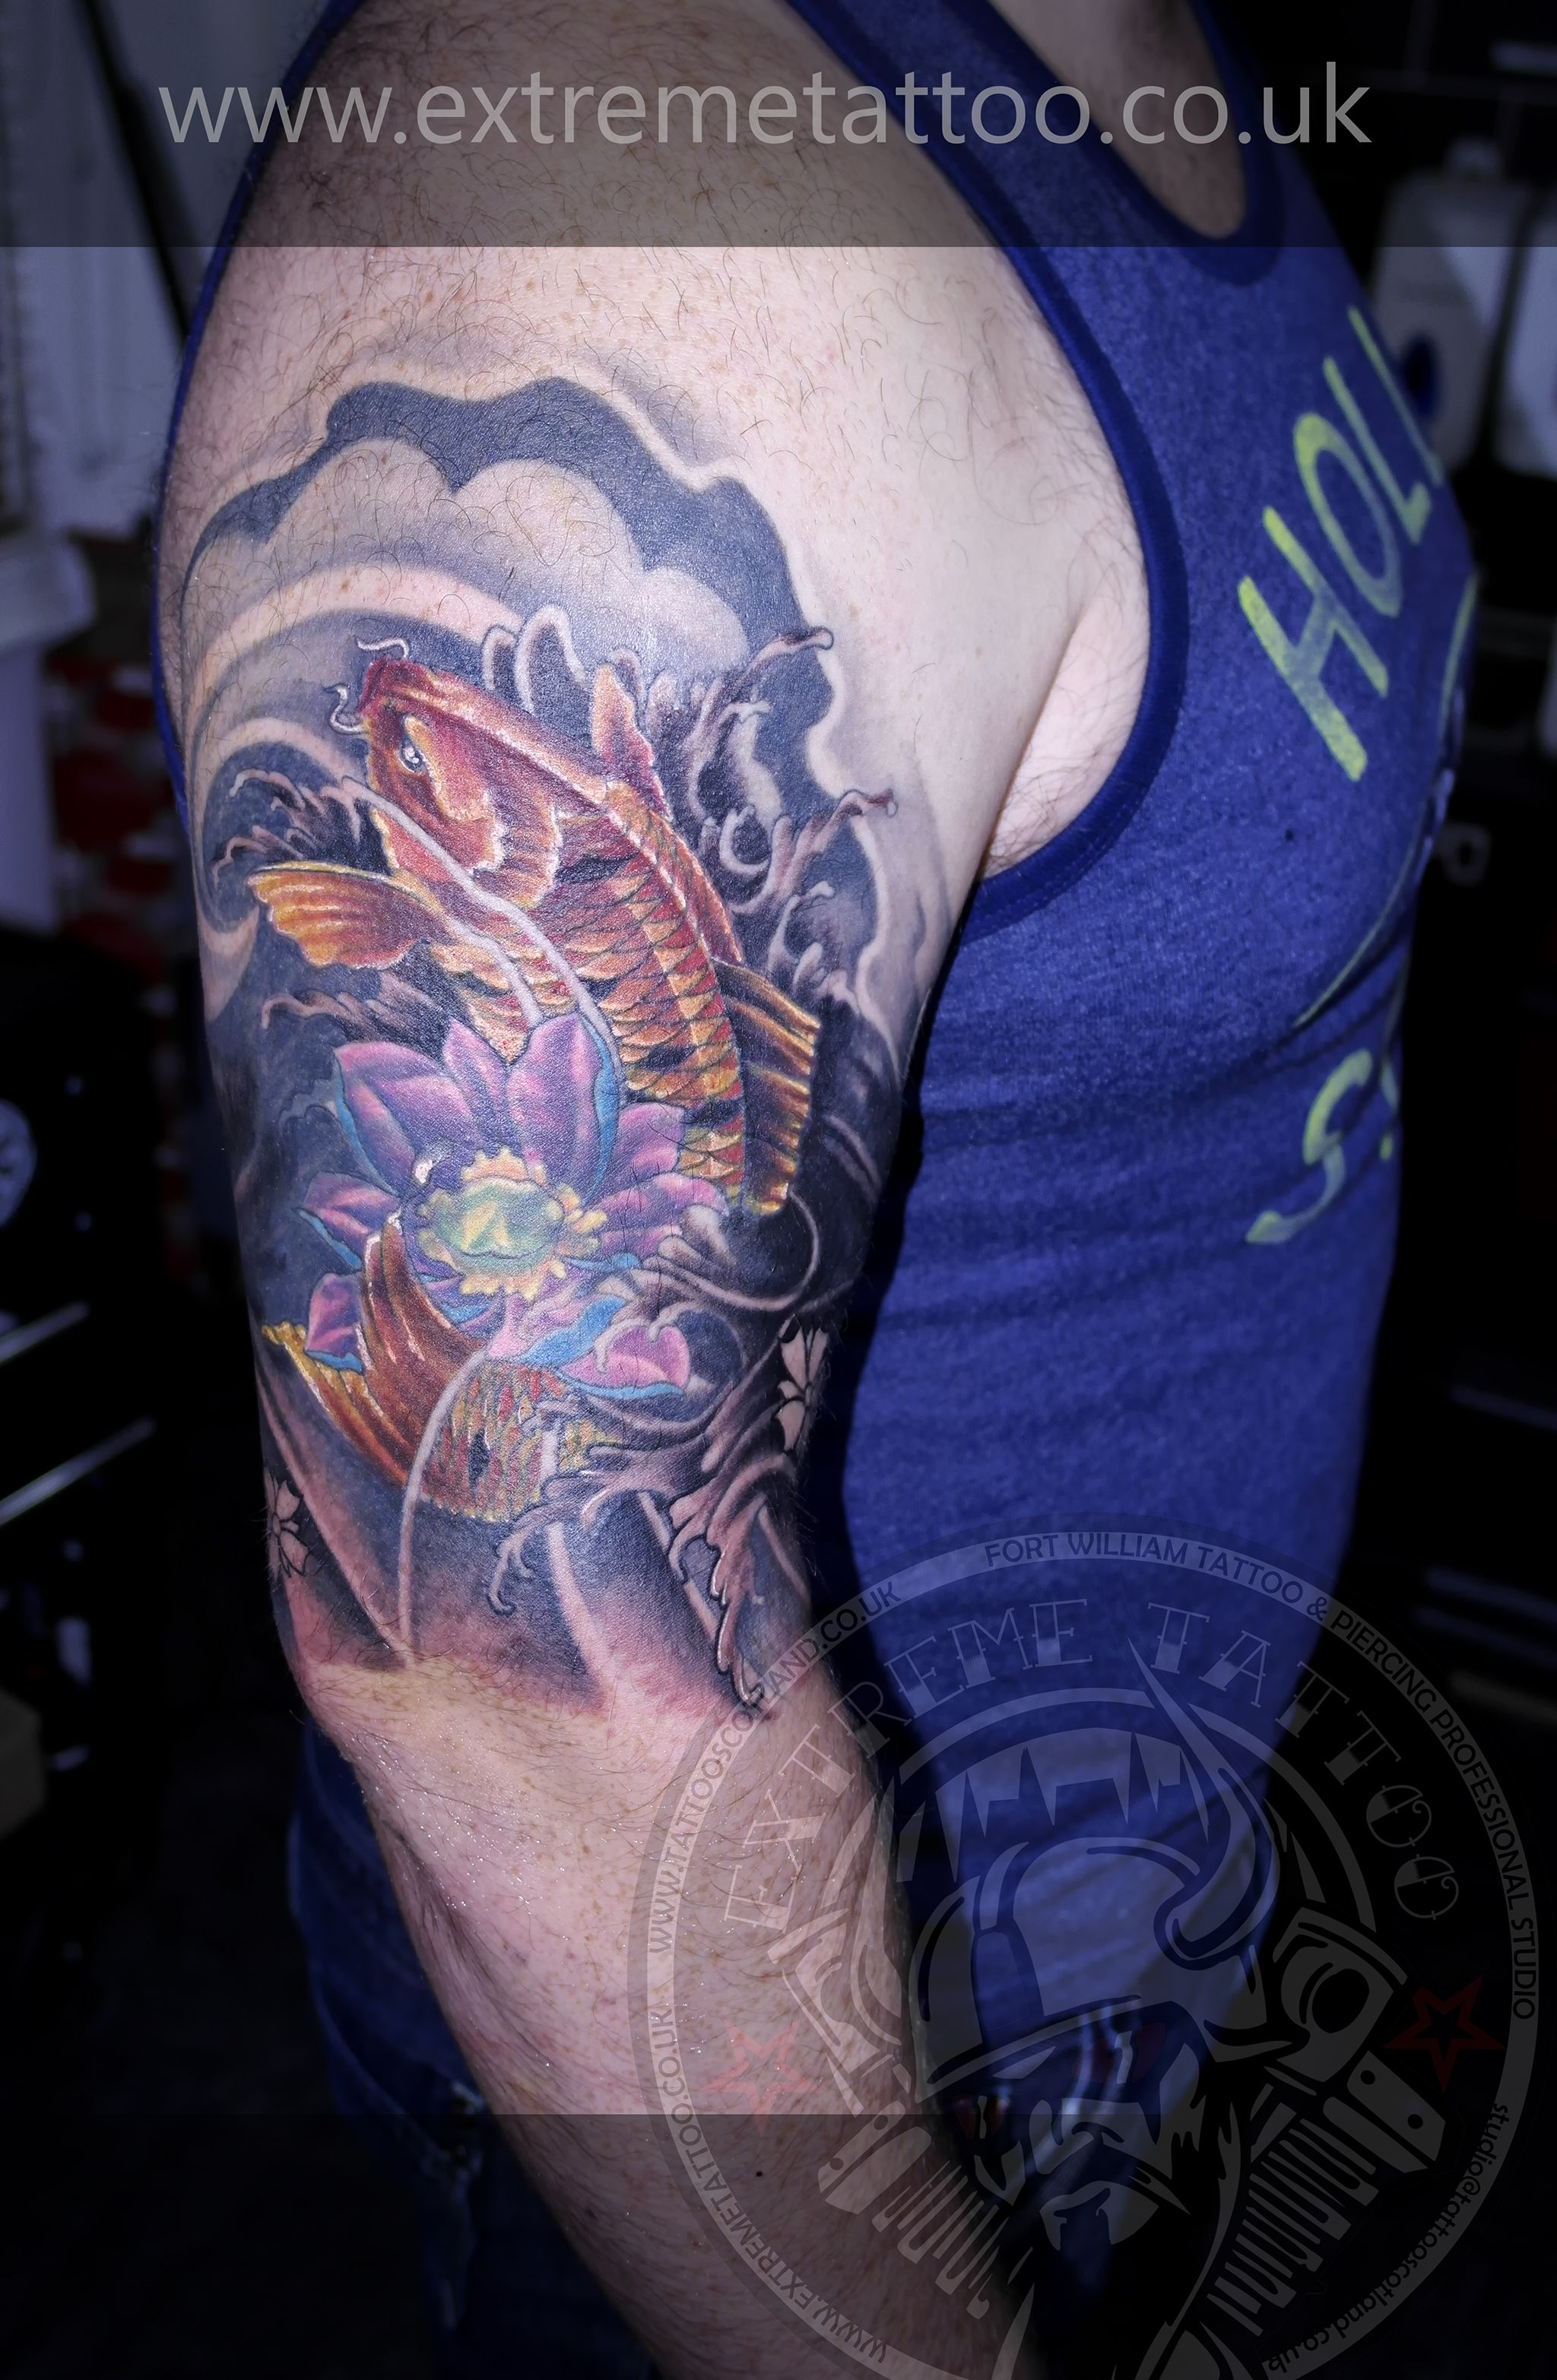 Koi fish tattoolotus flower tattoo sleeve in progresscover upgabi koi fish tattoolotus flower tattoo sleeve in progresscover upgabi tomescu izmirmasajfo Gallery